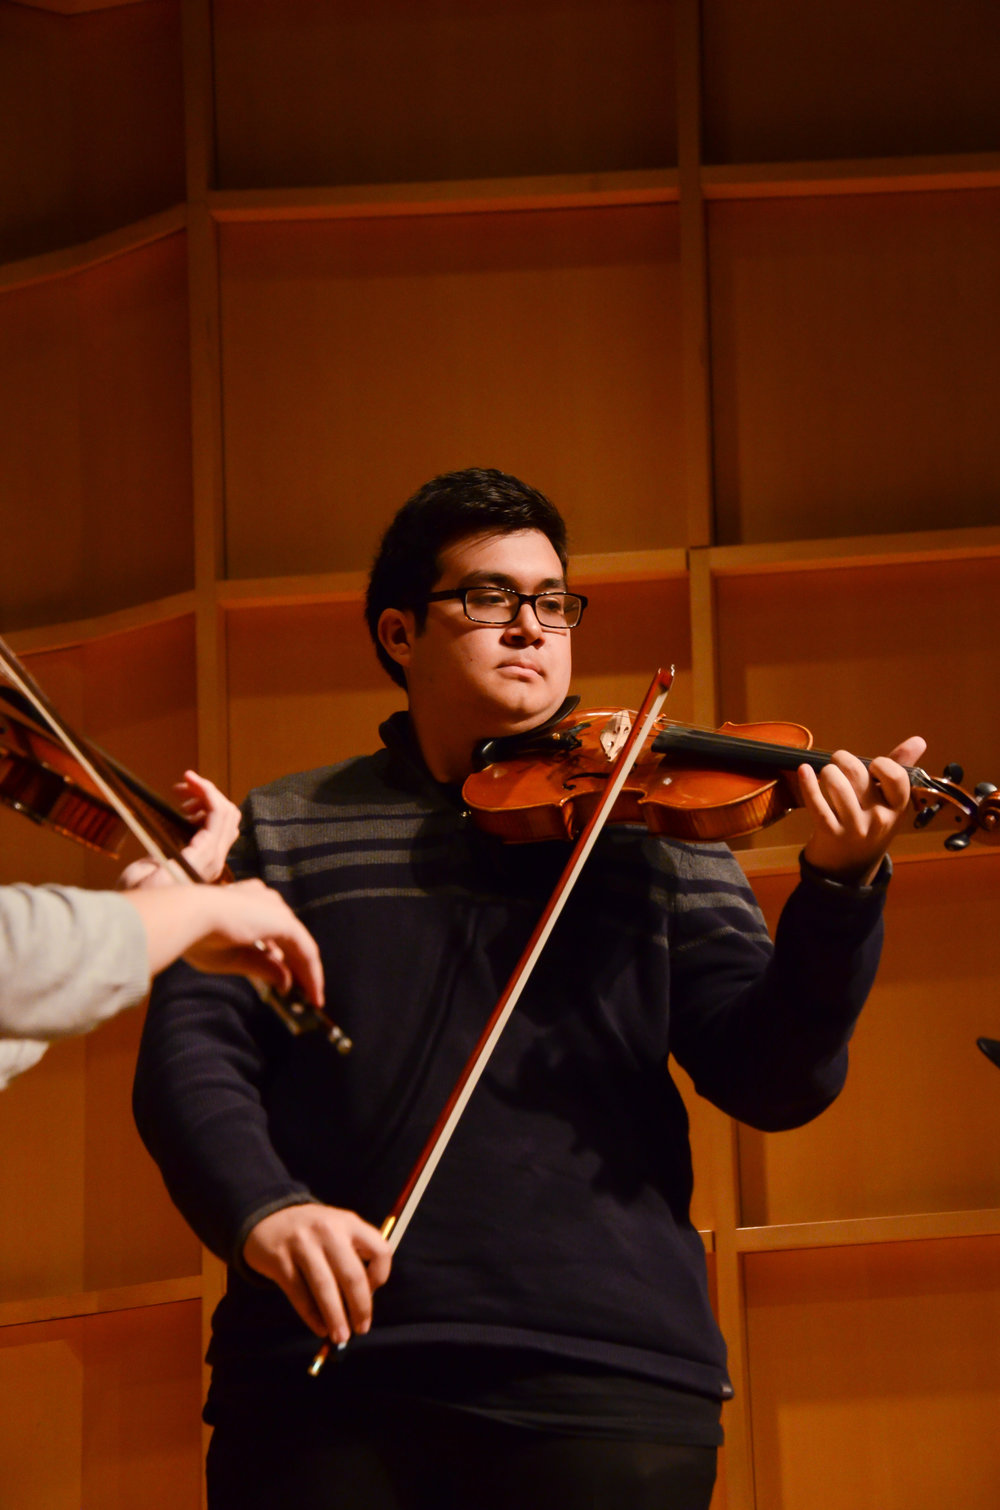 violin-13.jpg